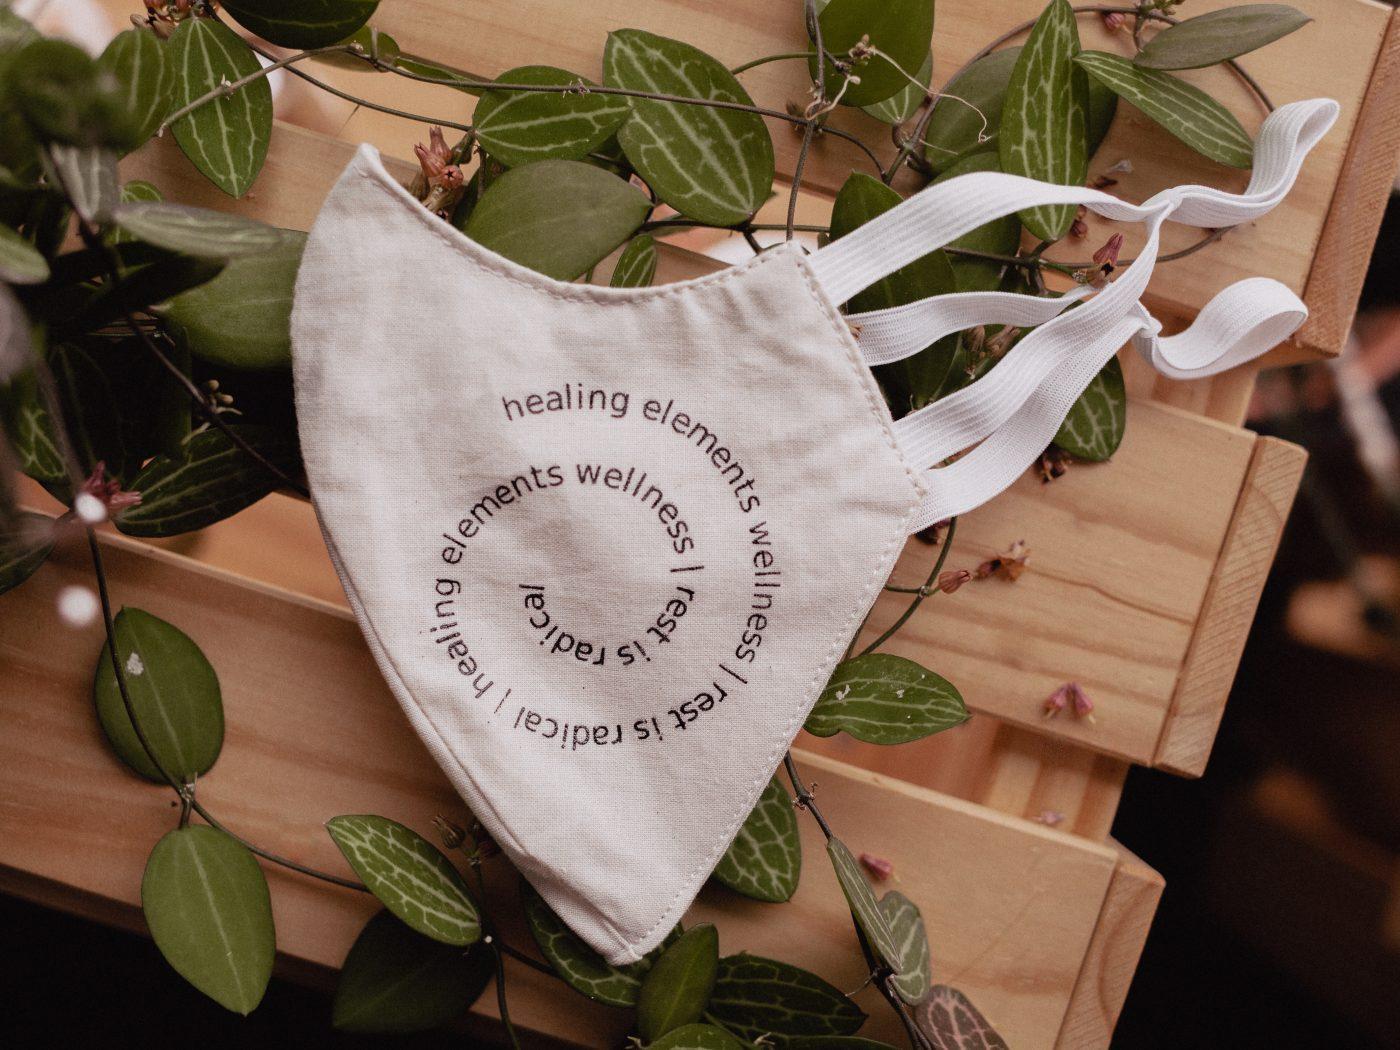 healing elements branded mask rest is radical